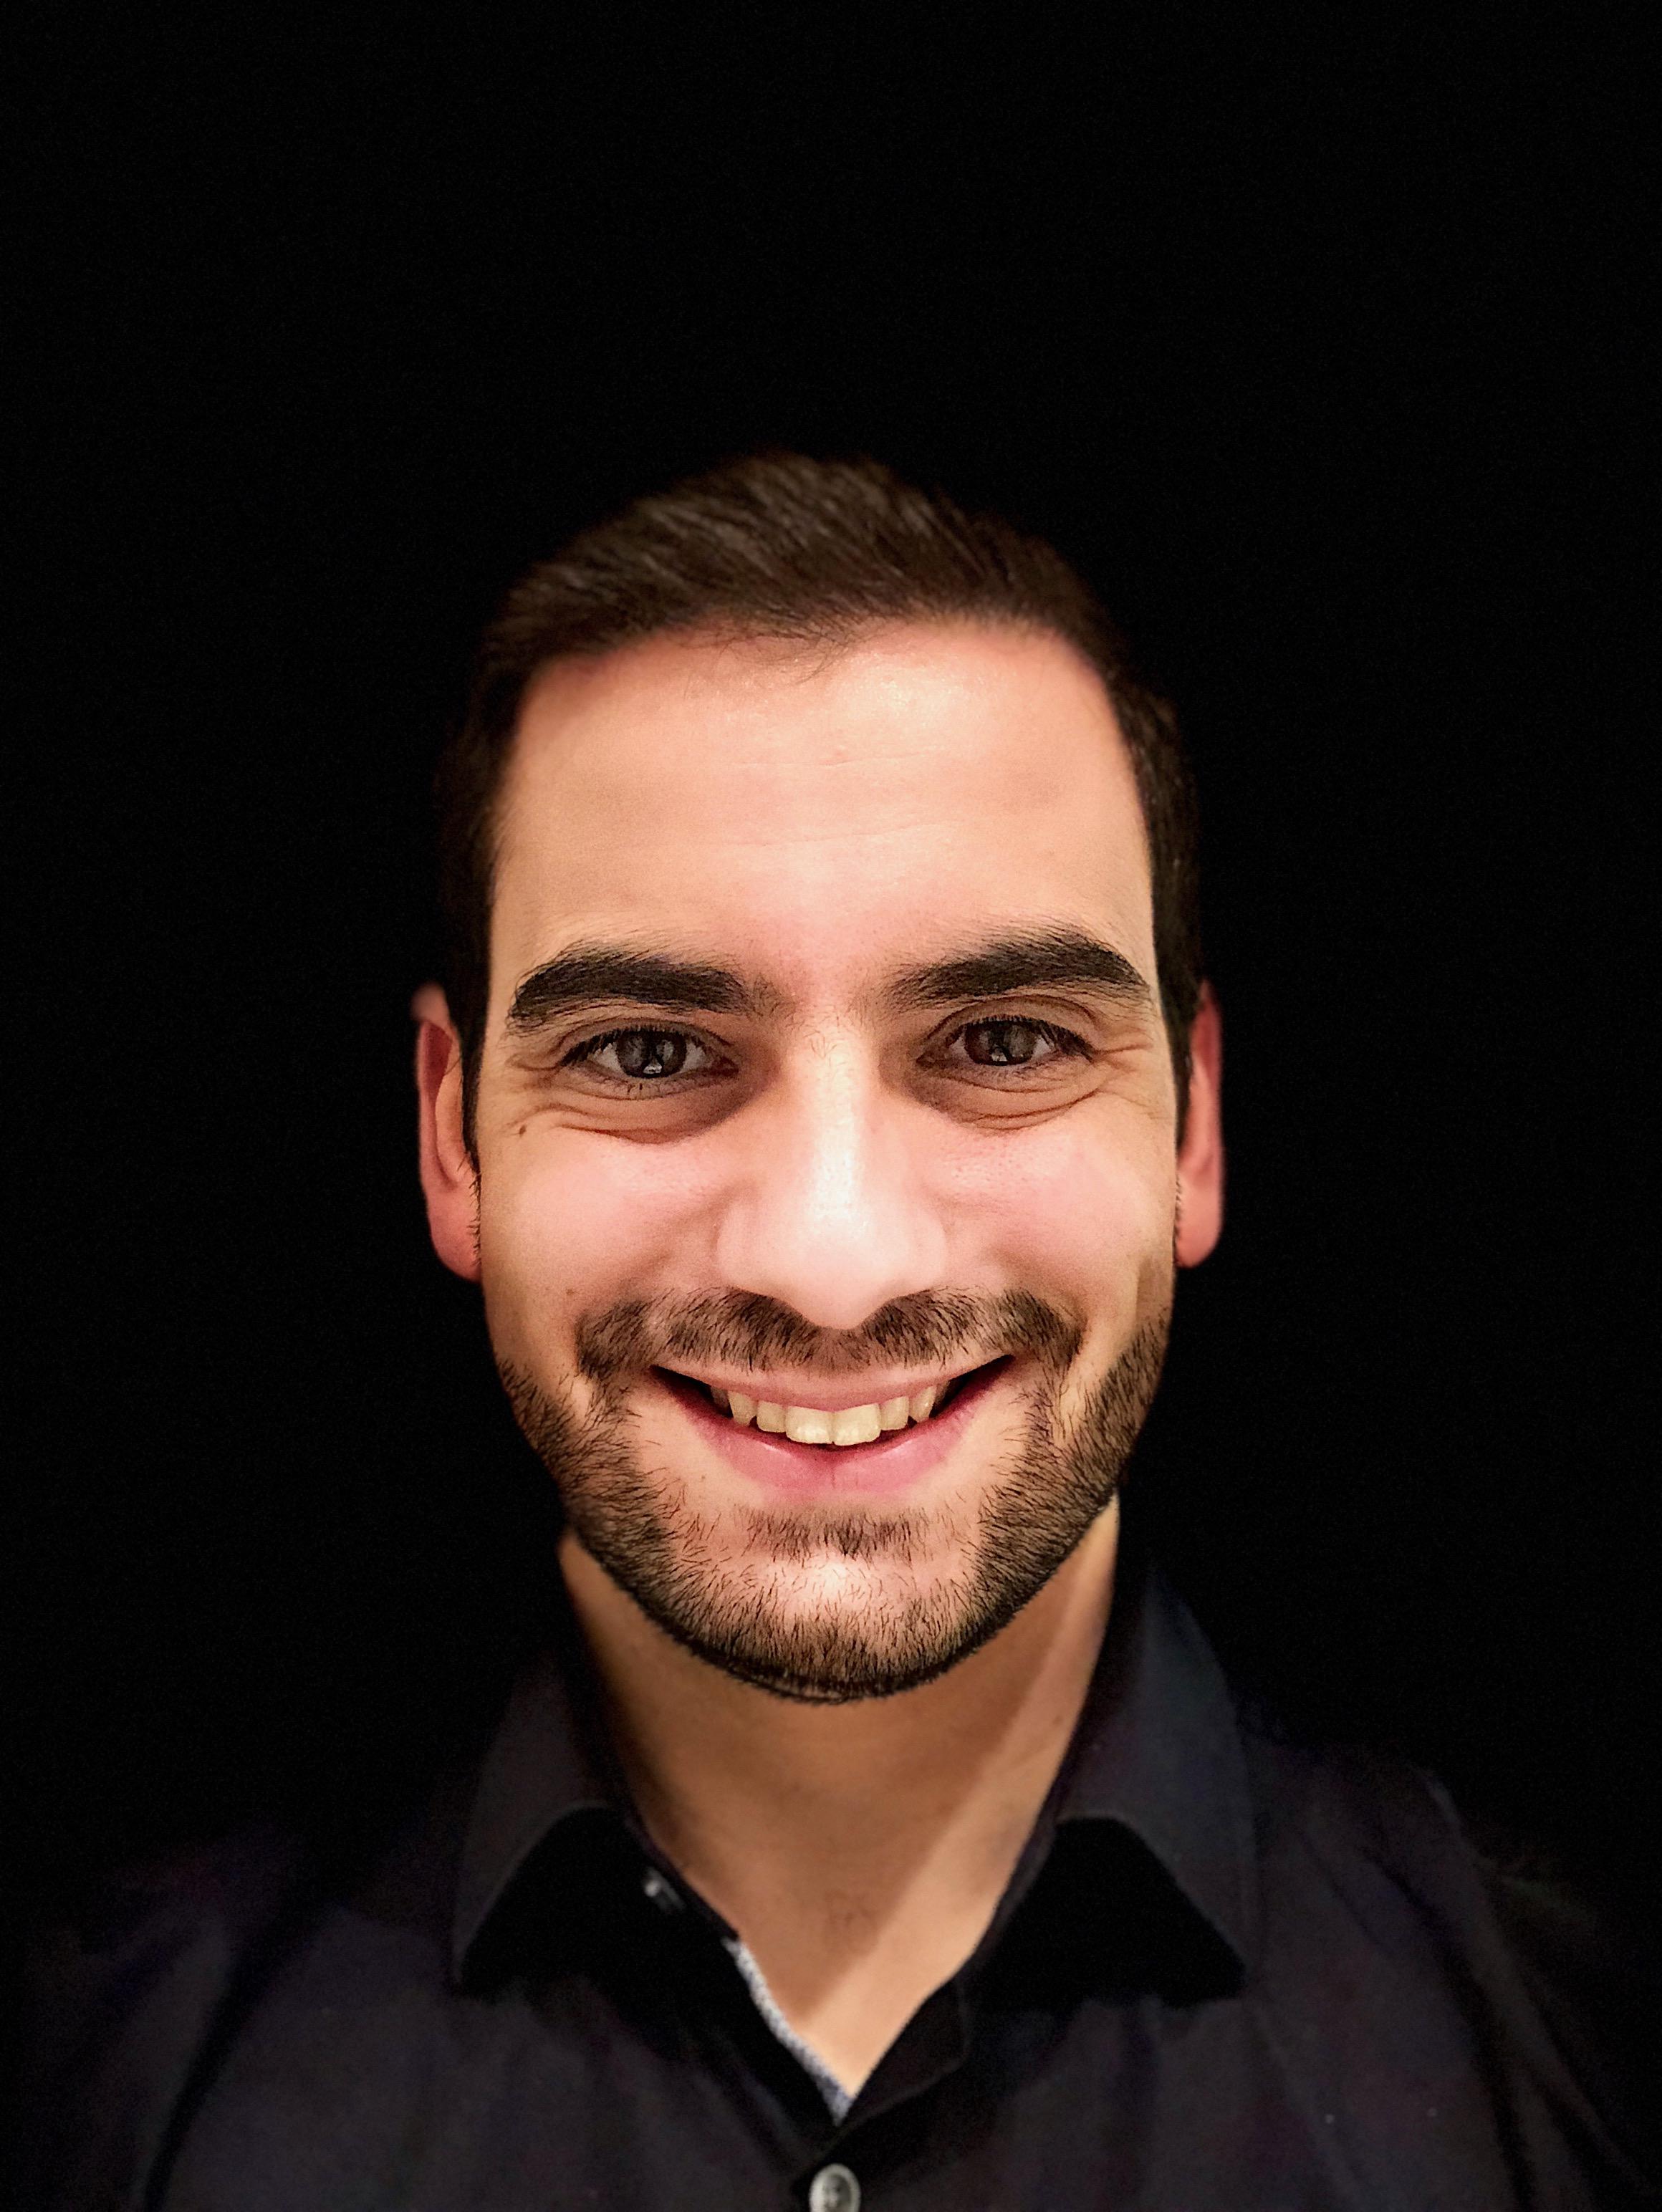 Foto Diogo sorrir.jpg